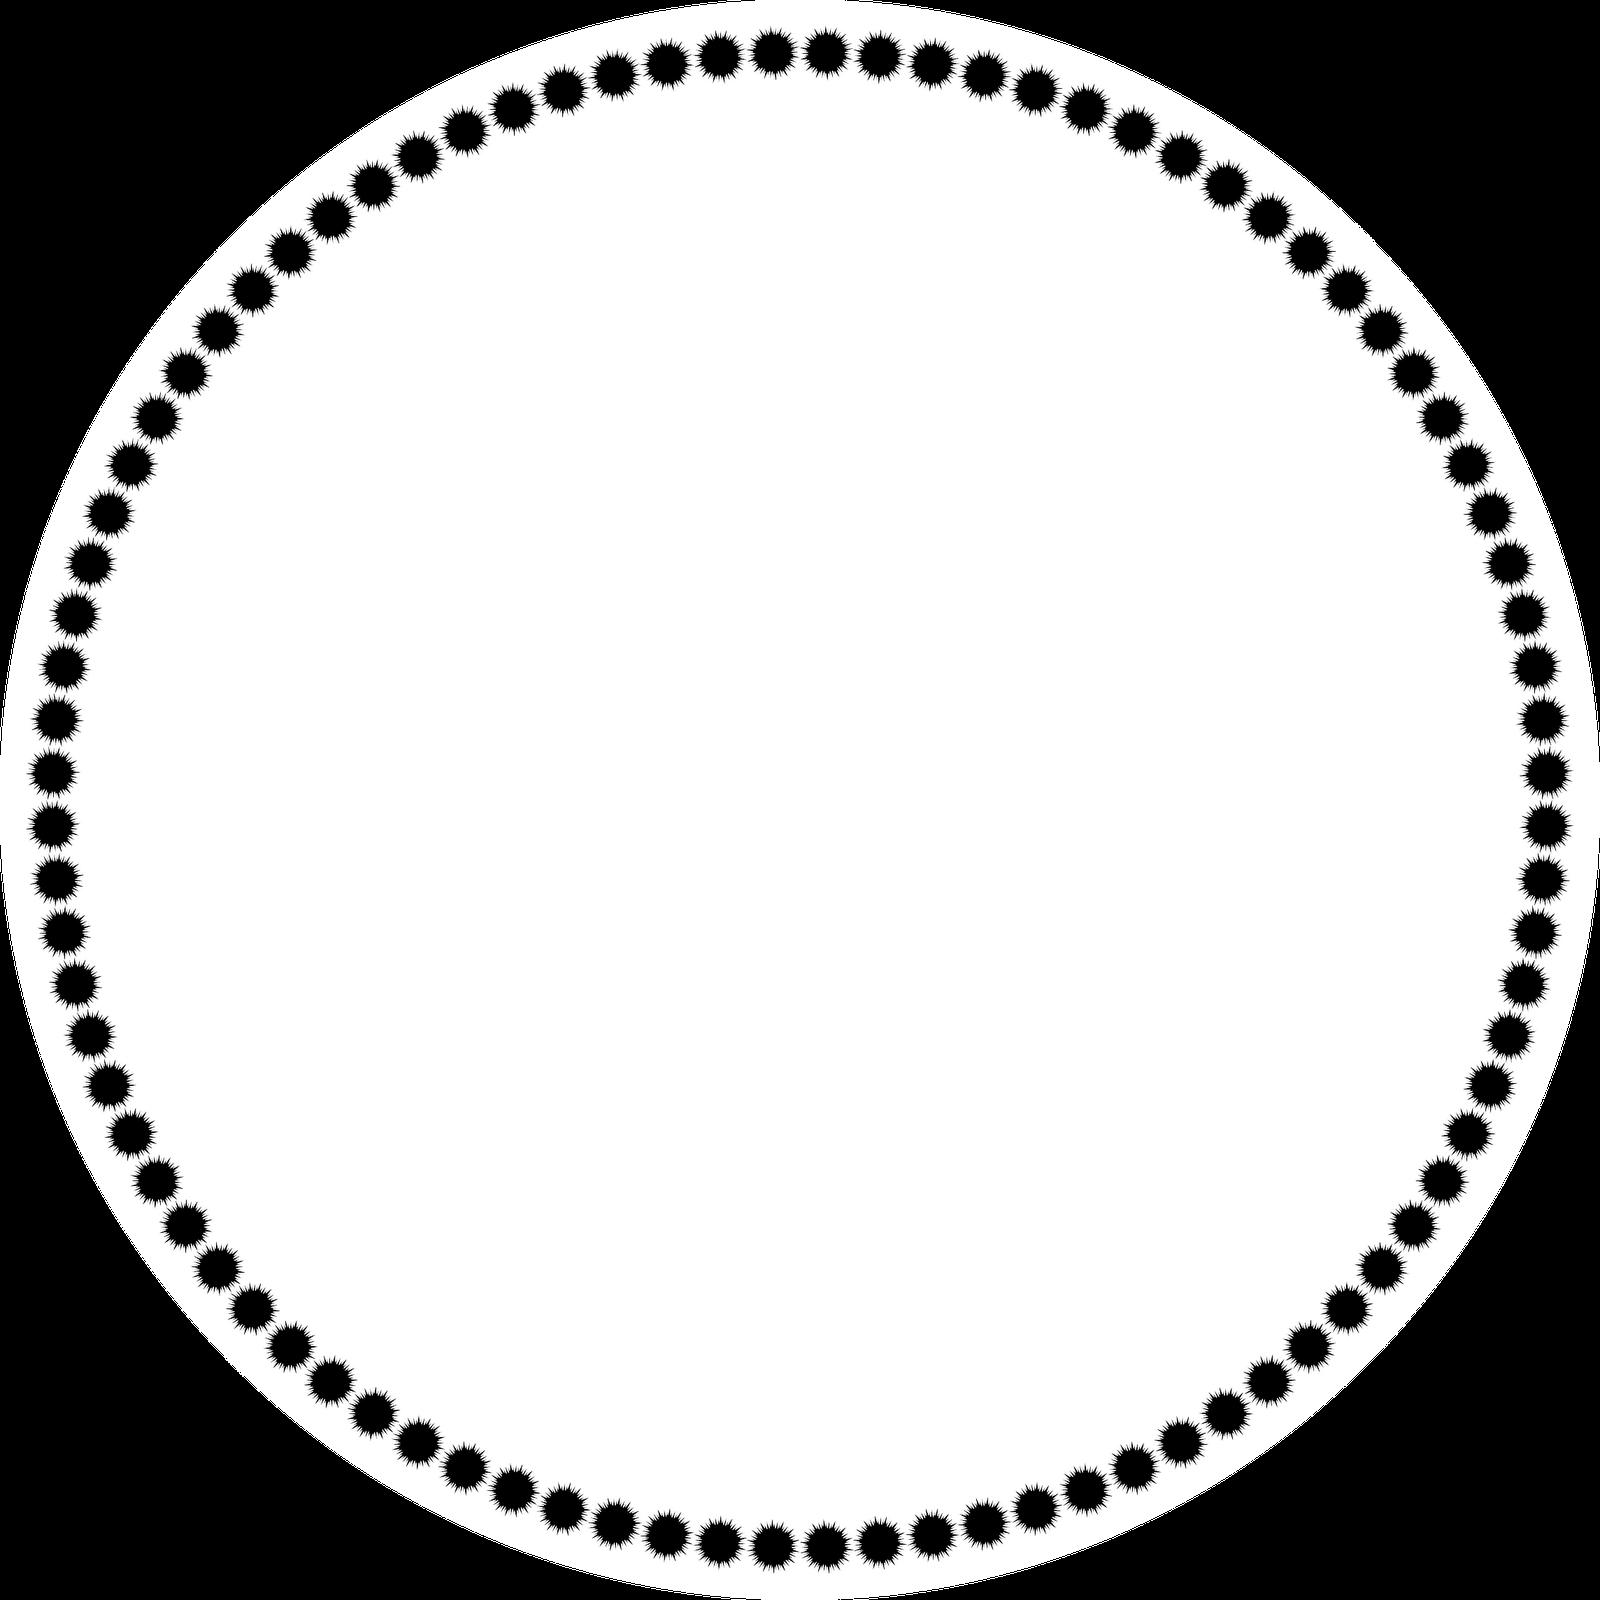 Circular frame clipart clip art library Free Circle Border Cliparts, Download Free Clip Art, Free Clip Art ... clip art library